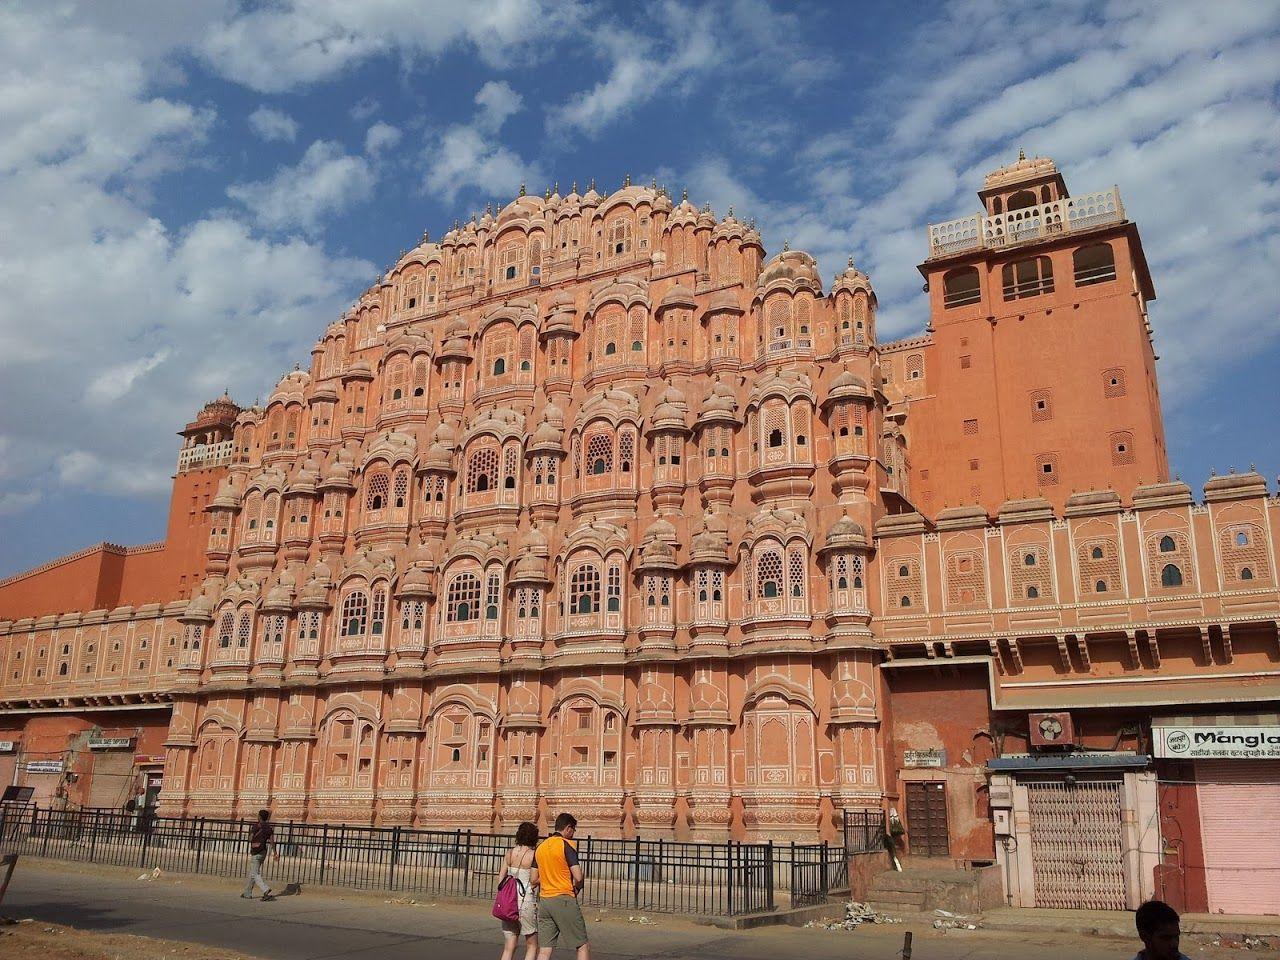 India 2012 Palacio en Jaipur